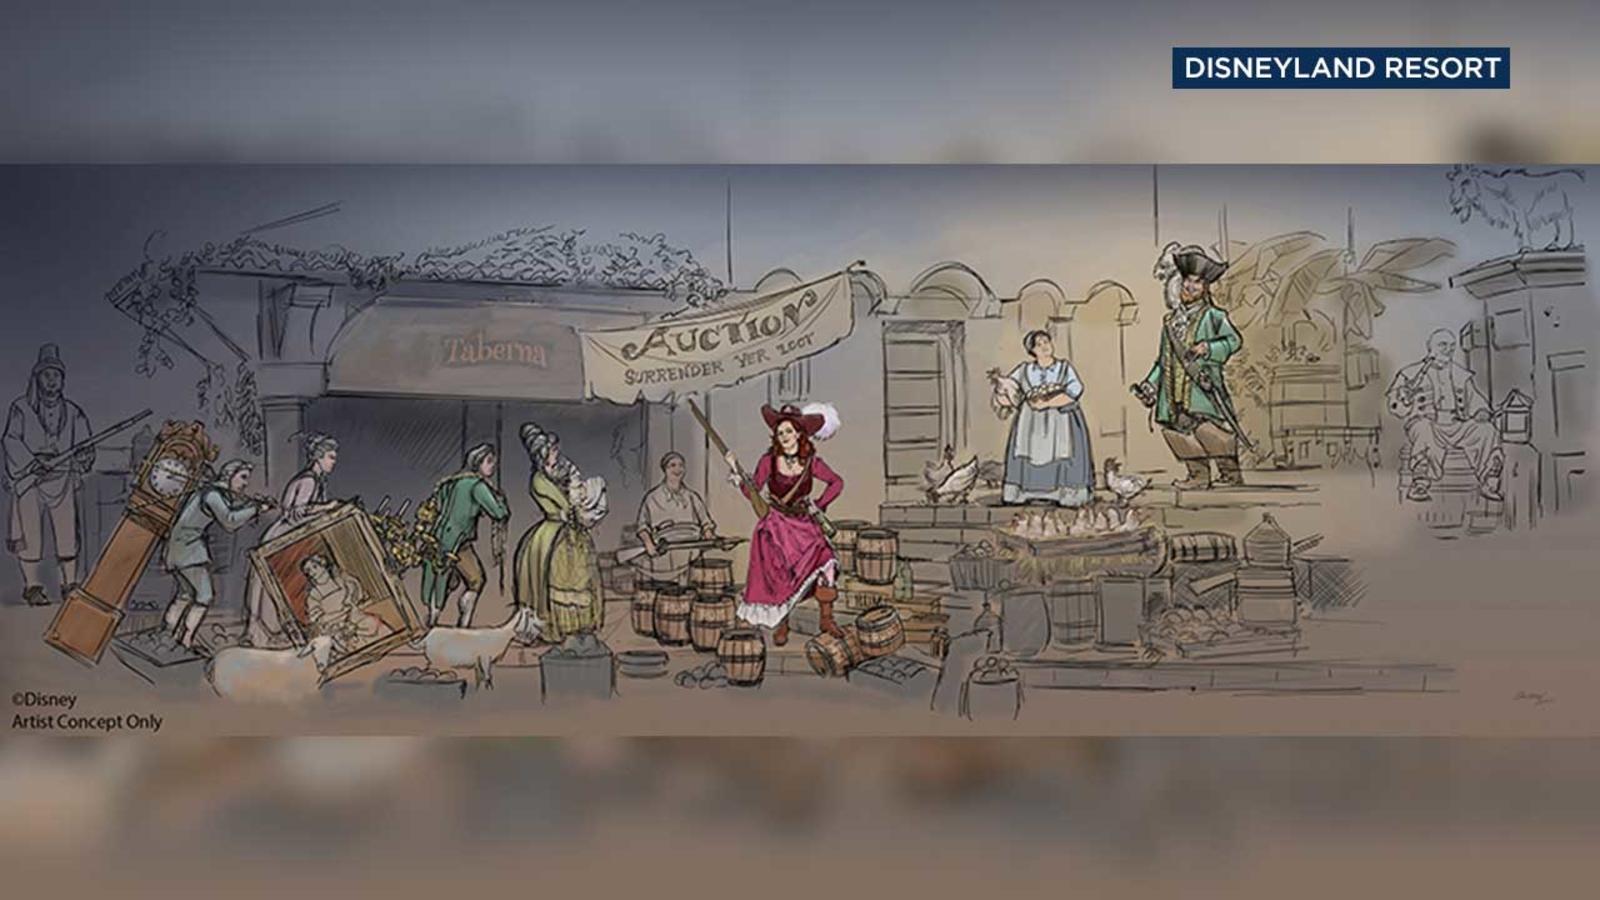 Disneyland Makes Big Change To Pirates Of The Caribbean Ride Abc7 San Francisco